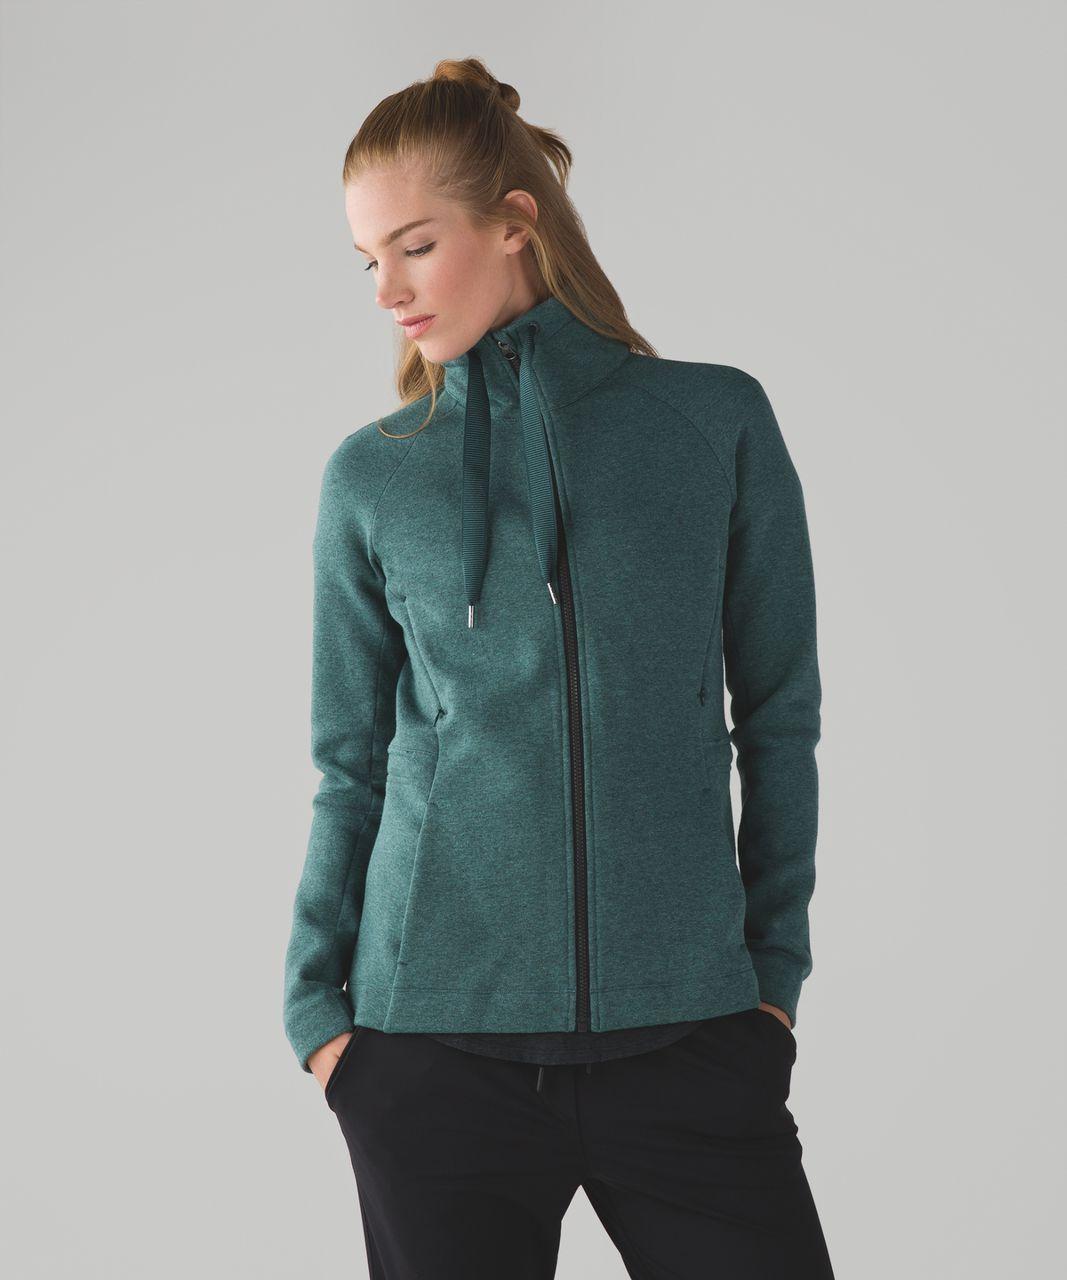 5777d20501 Lululemon &go Take-Off Fleece - Heathered Deep Green | Lululemon ...